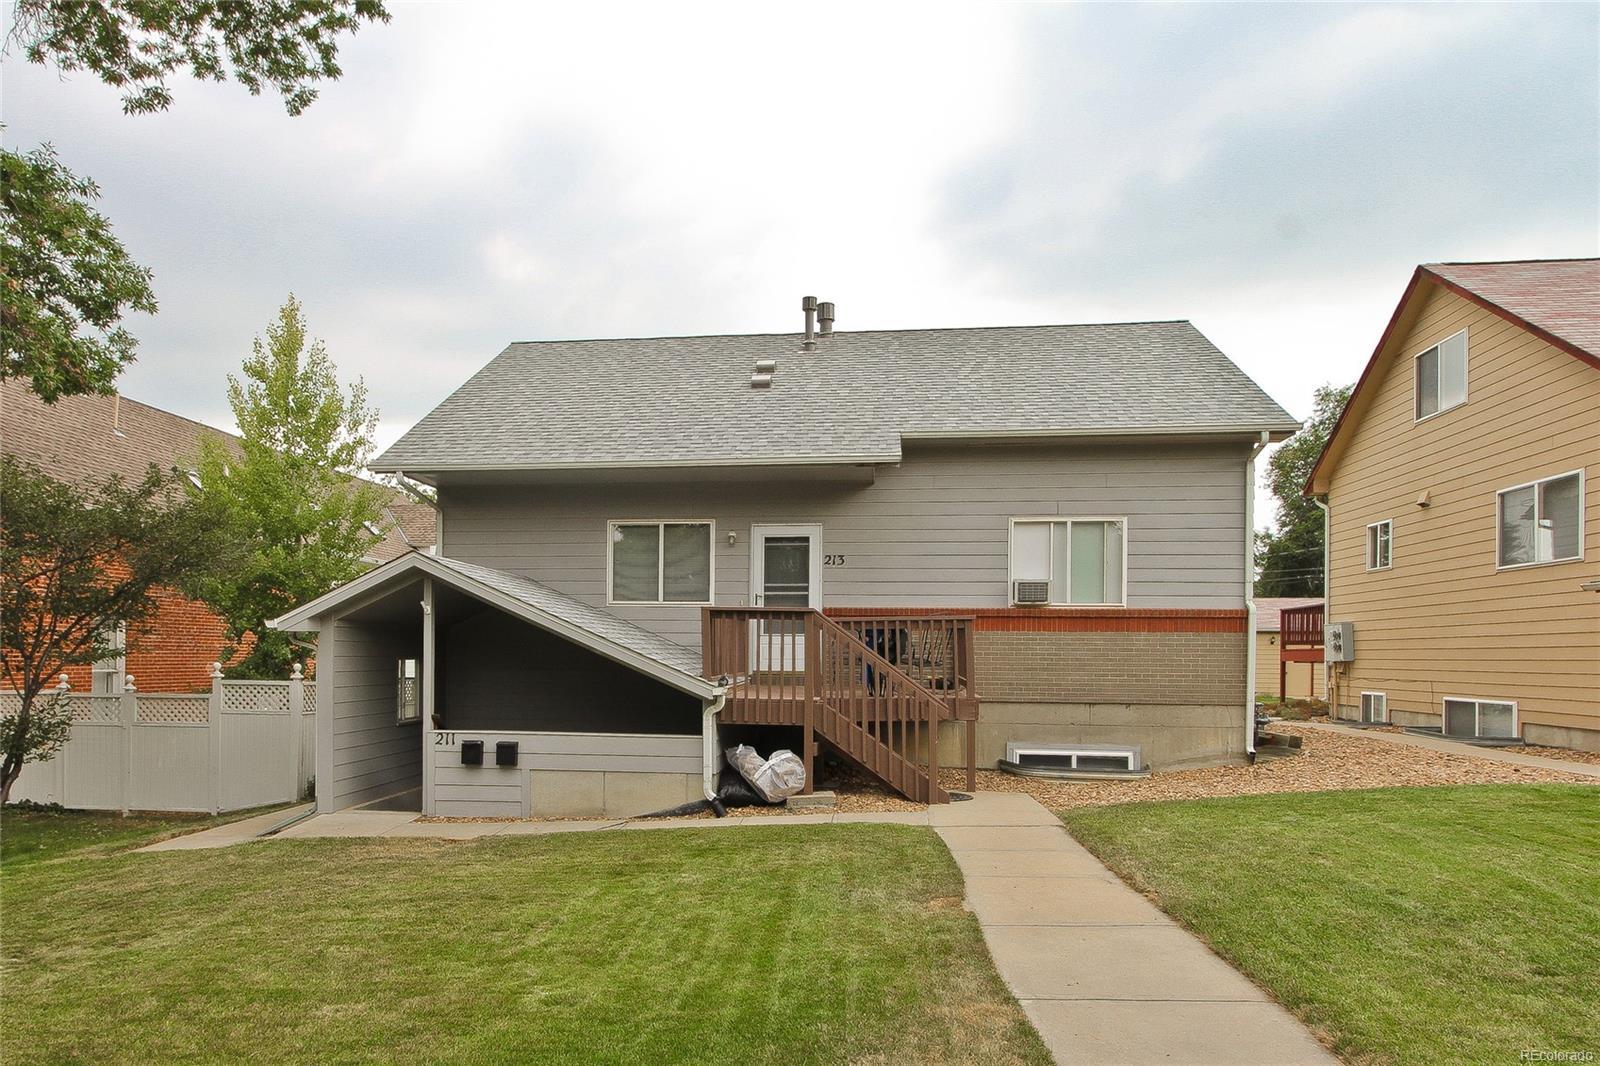 213 Bowen Street, Longmont, CO 80501 - Longmont, CO real estate listing